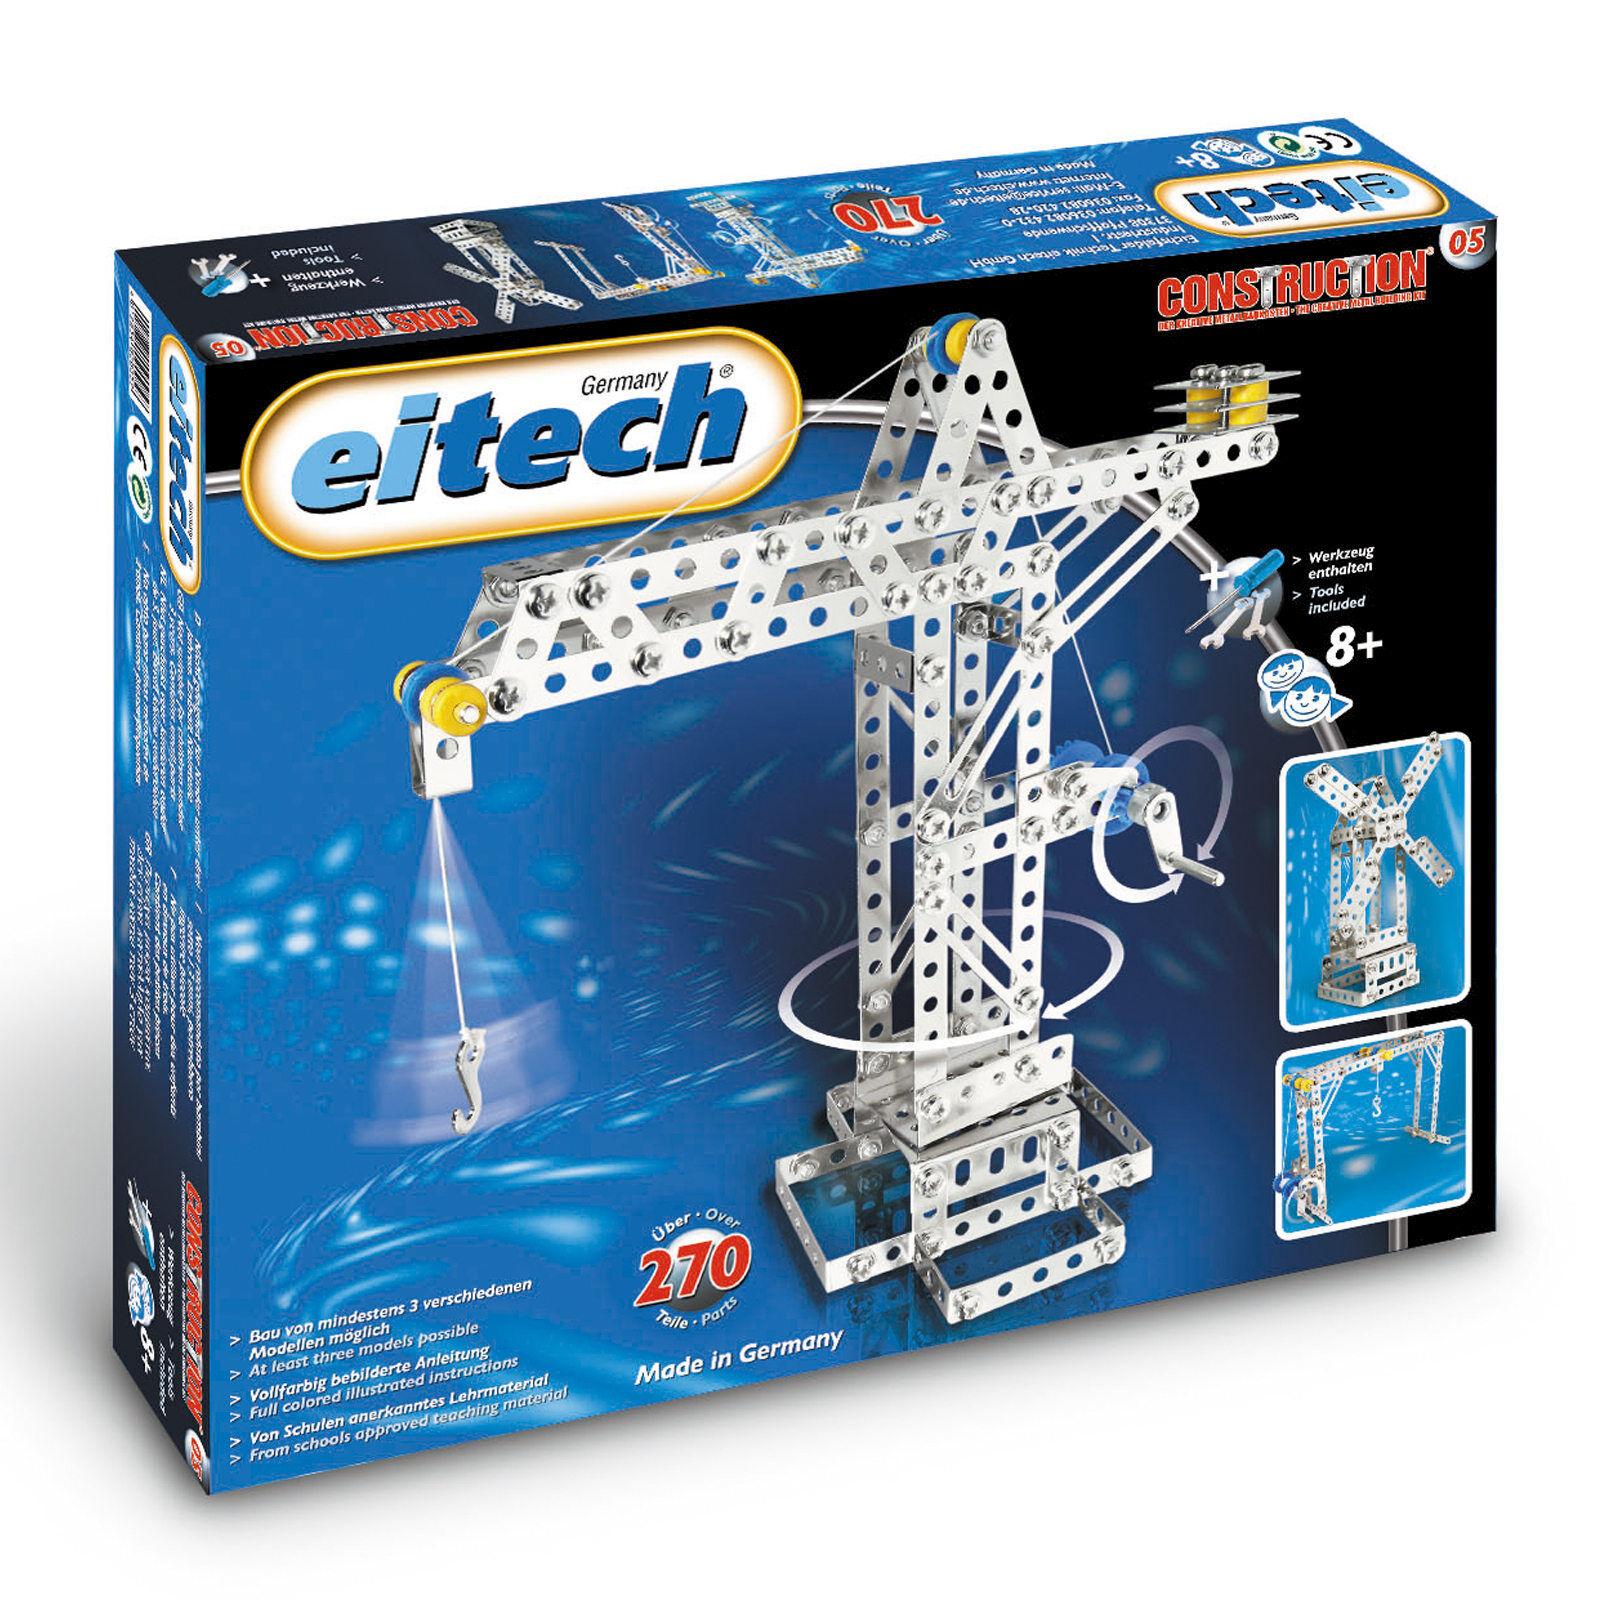 Eitech Metal Construction Sets Universal Lift Bridge 13 13 13 13 16x11 5ad40a